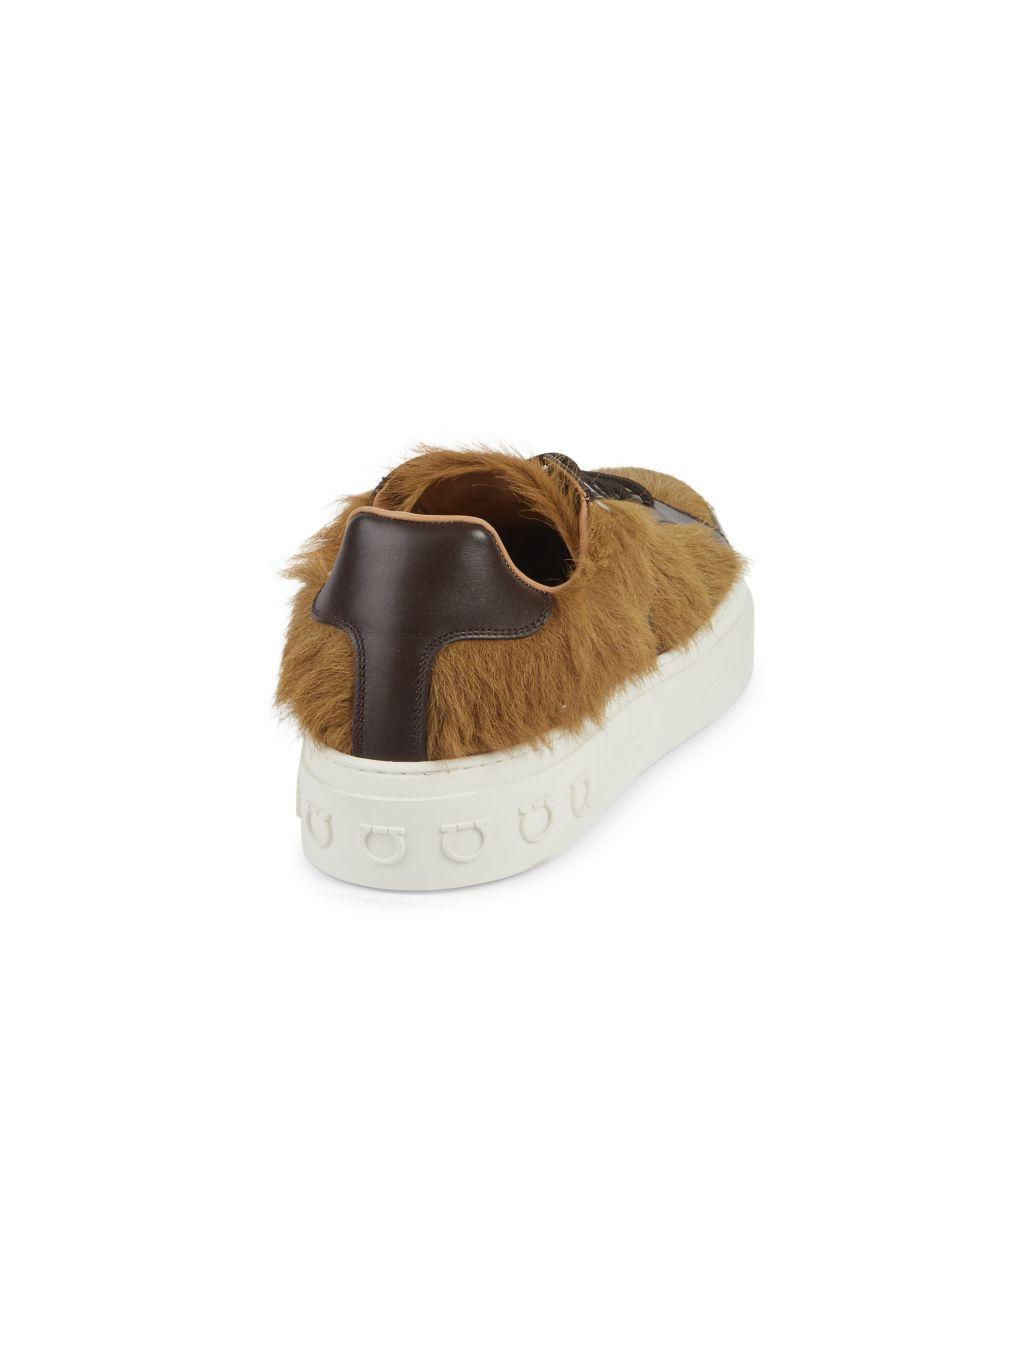 Salvatore Ferragamo Calf Hair & Leather Sneakers